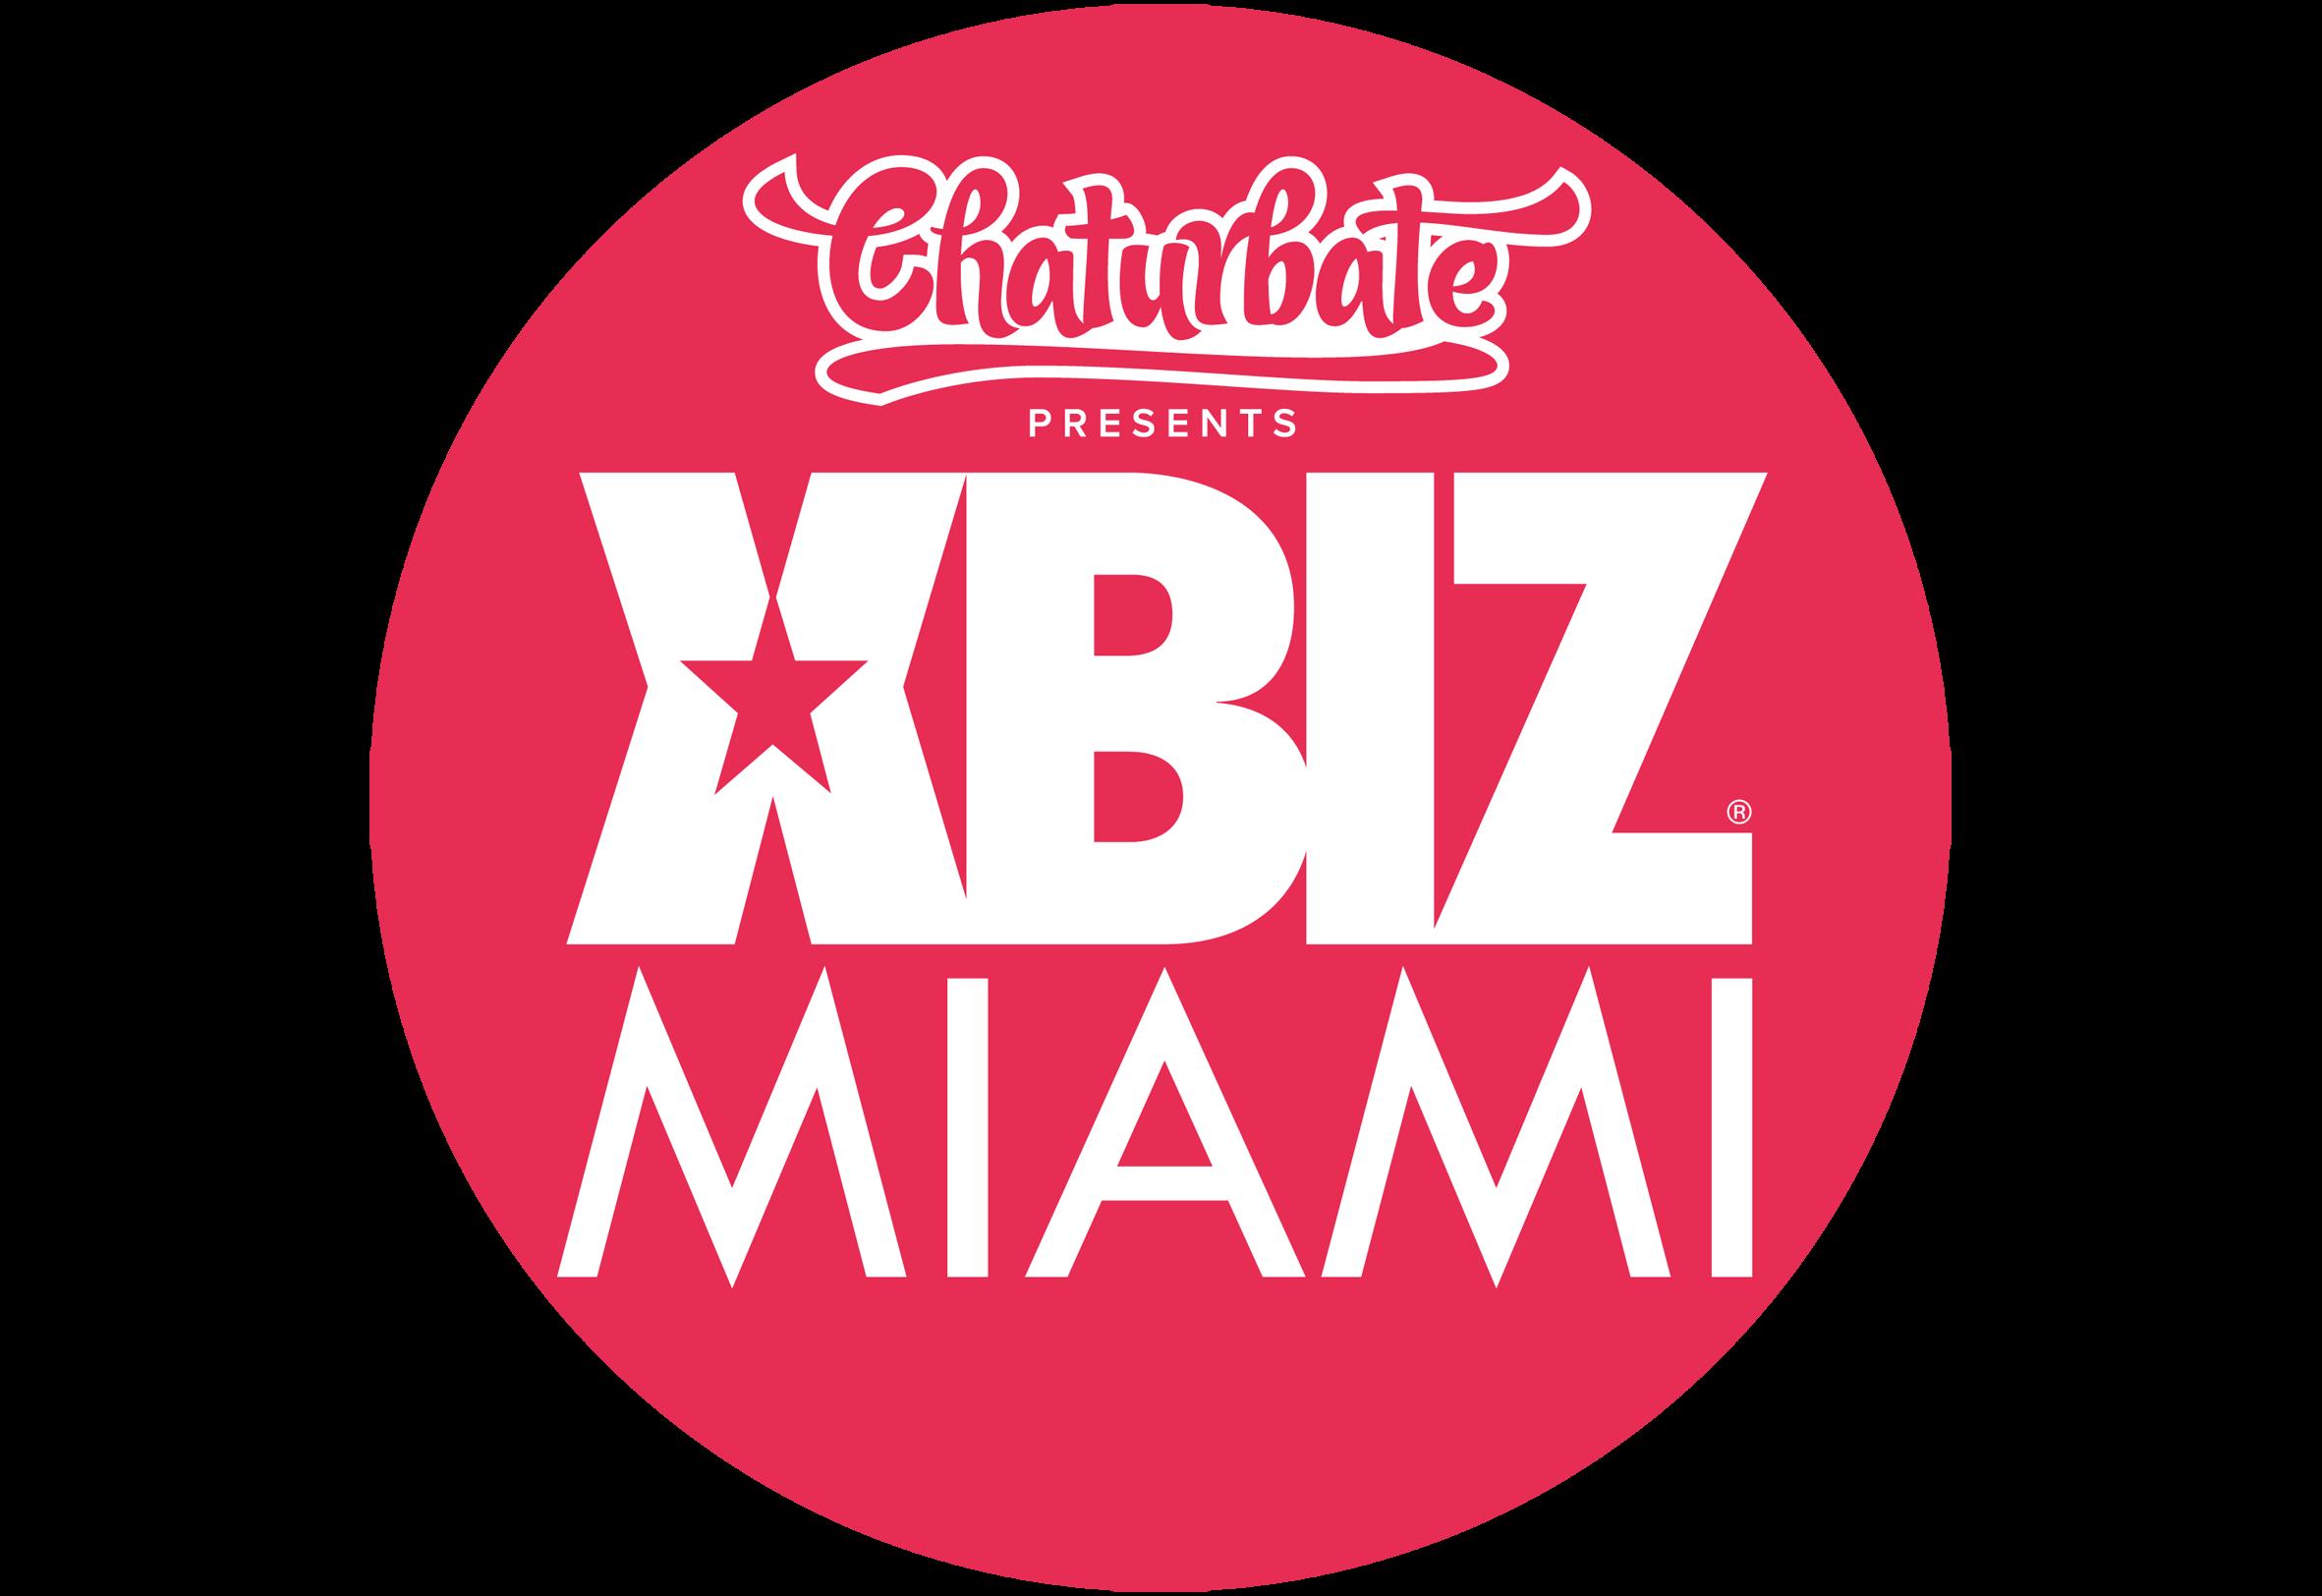 XBIZ Miami Virtual